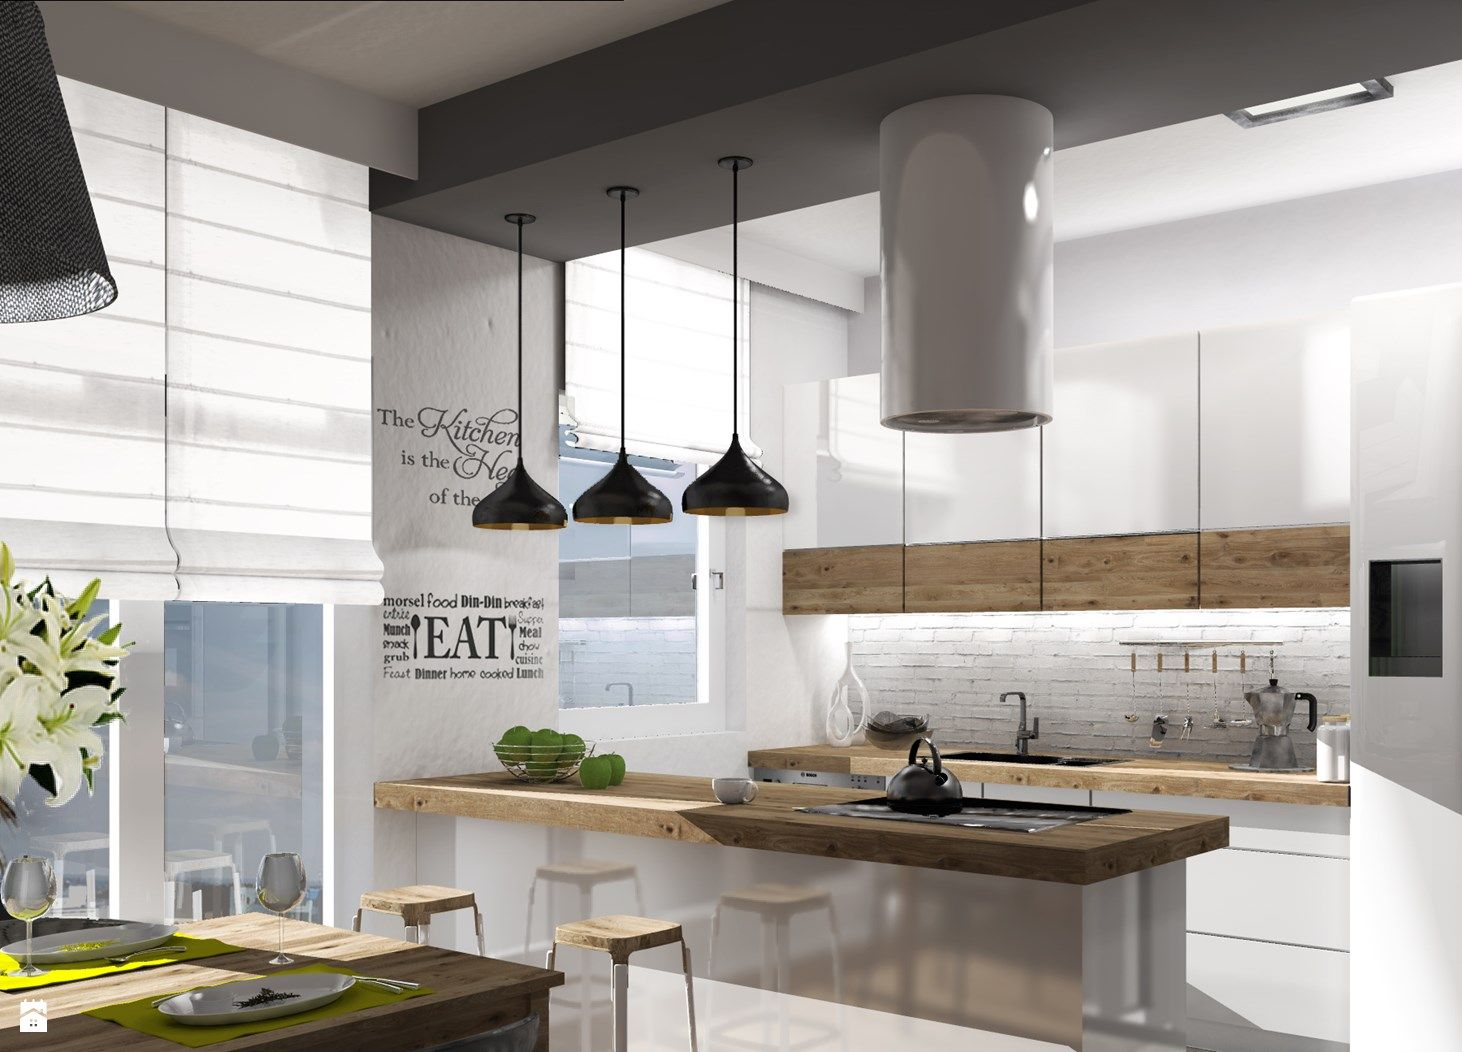 Küchendesign u-typ zdjęcie kuchnia  kuchnia  pinterest  kitchens interiors and